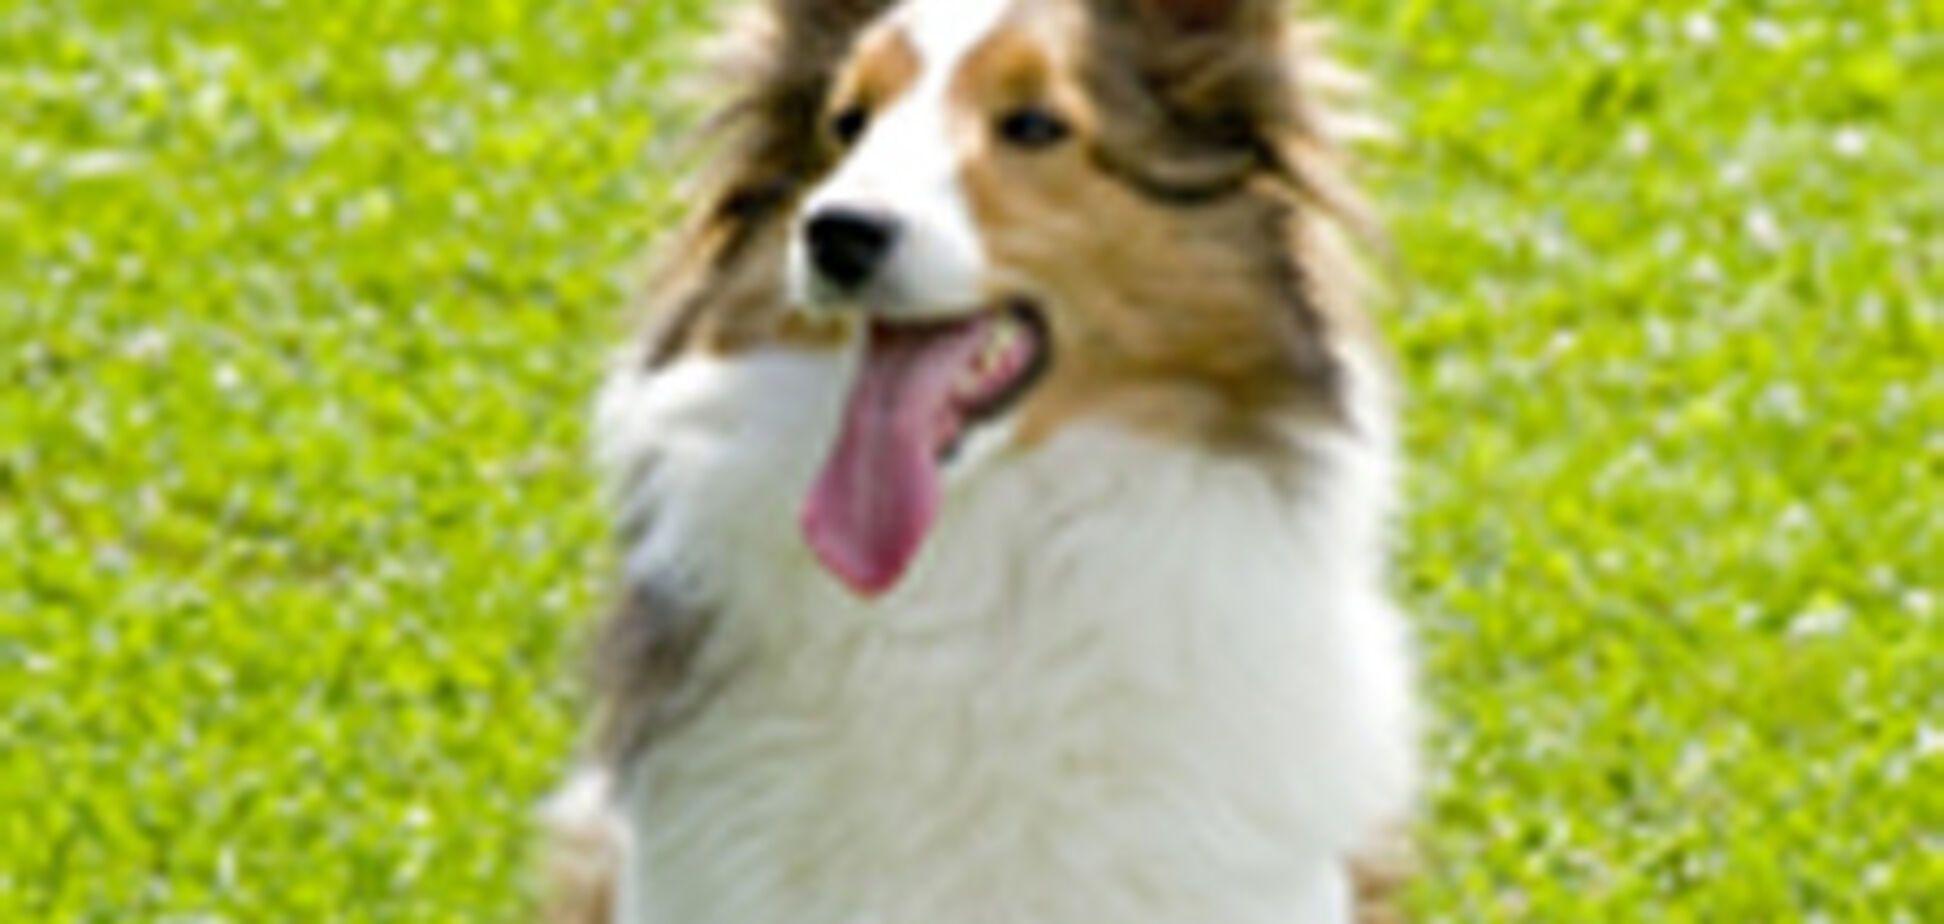 Названа найрозумніша порода собак